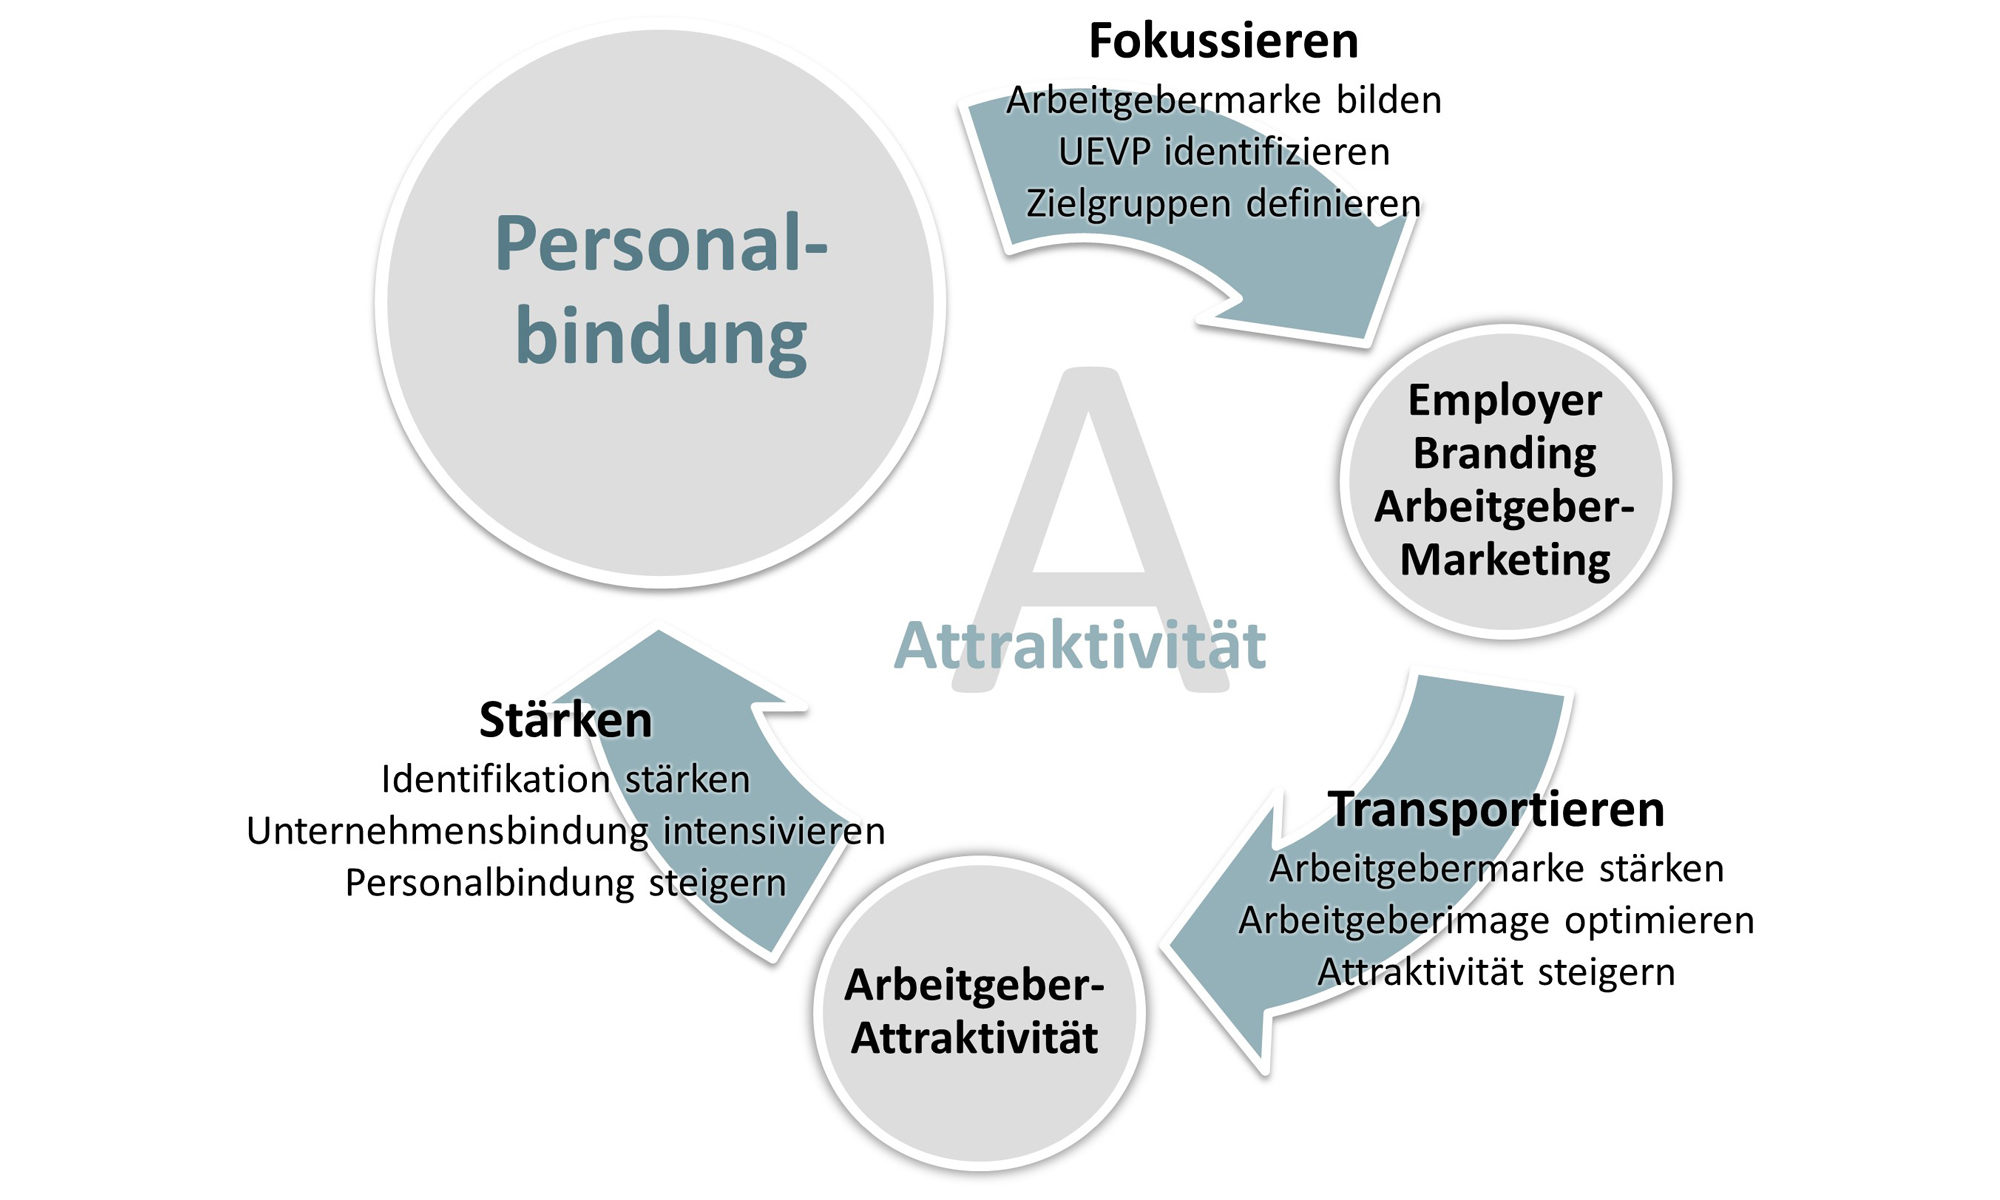 Arbeitgeberattraktivität, attraktiv als Arbeitgeber, Employer Branding, Arbeitgebermarketing